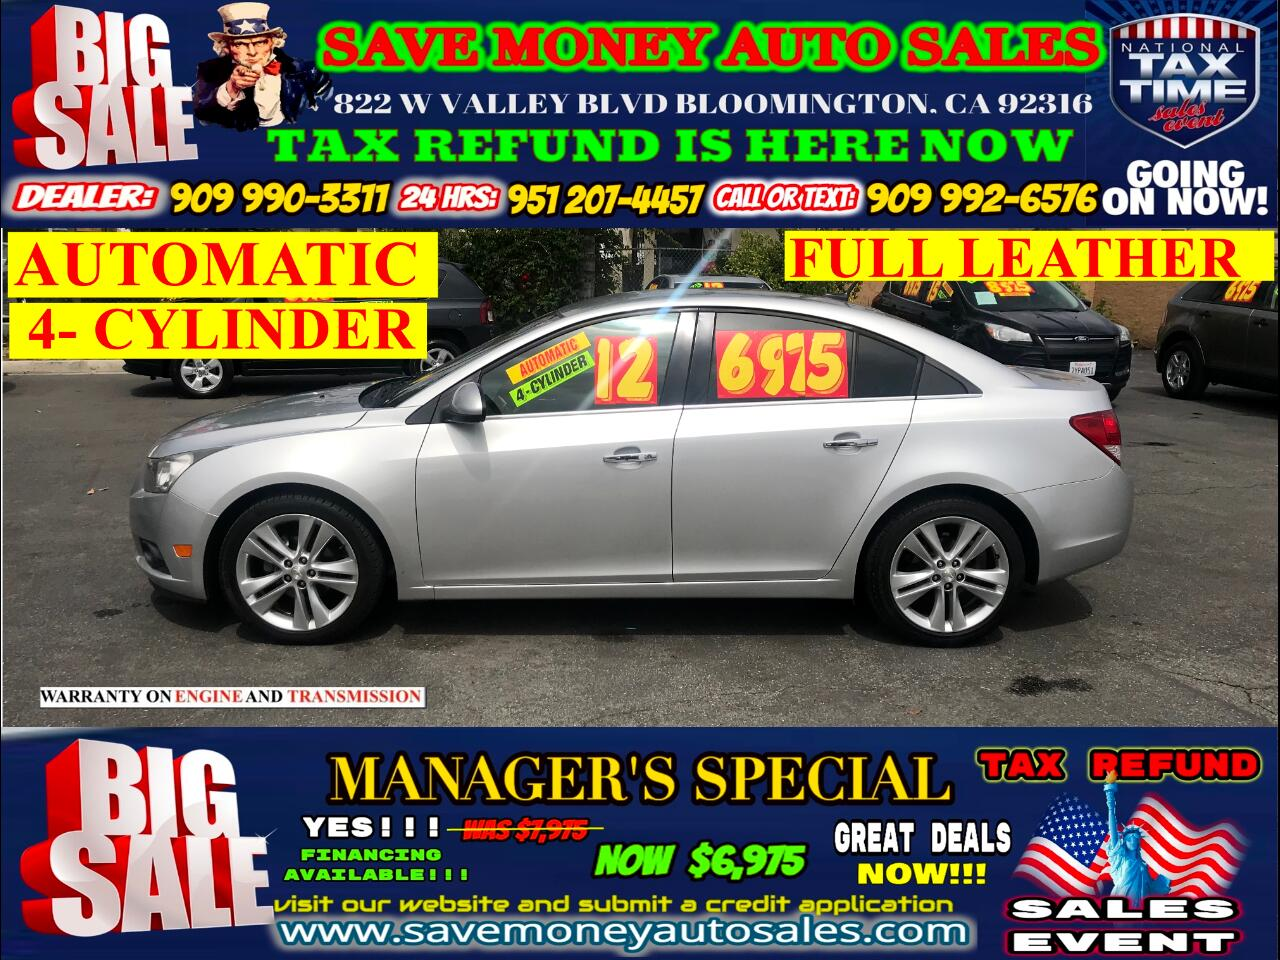 2012 Chevrolet Cruze LTZ> 4 CYLINDER>LOW MILES> FULL LEATHER